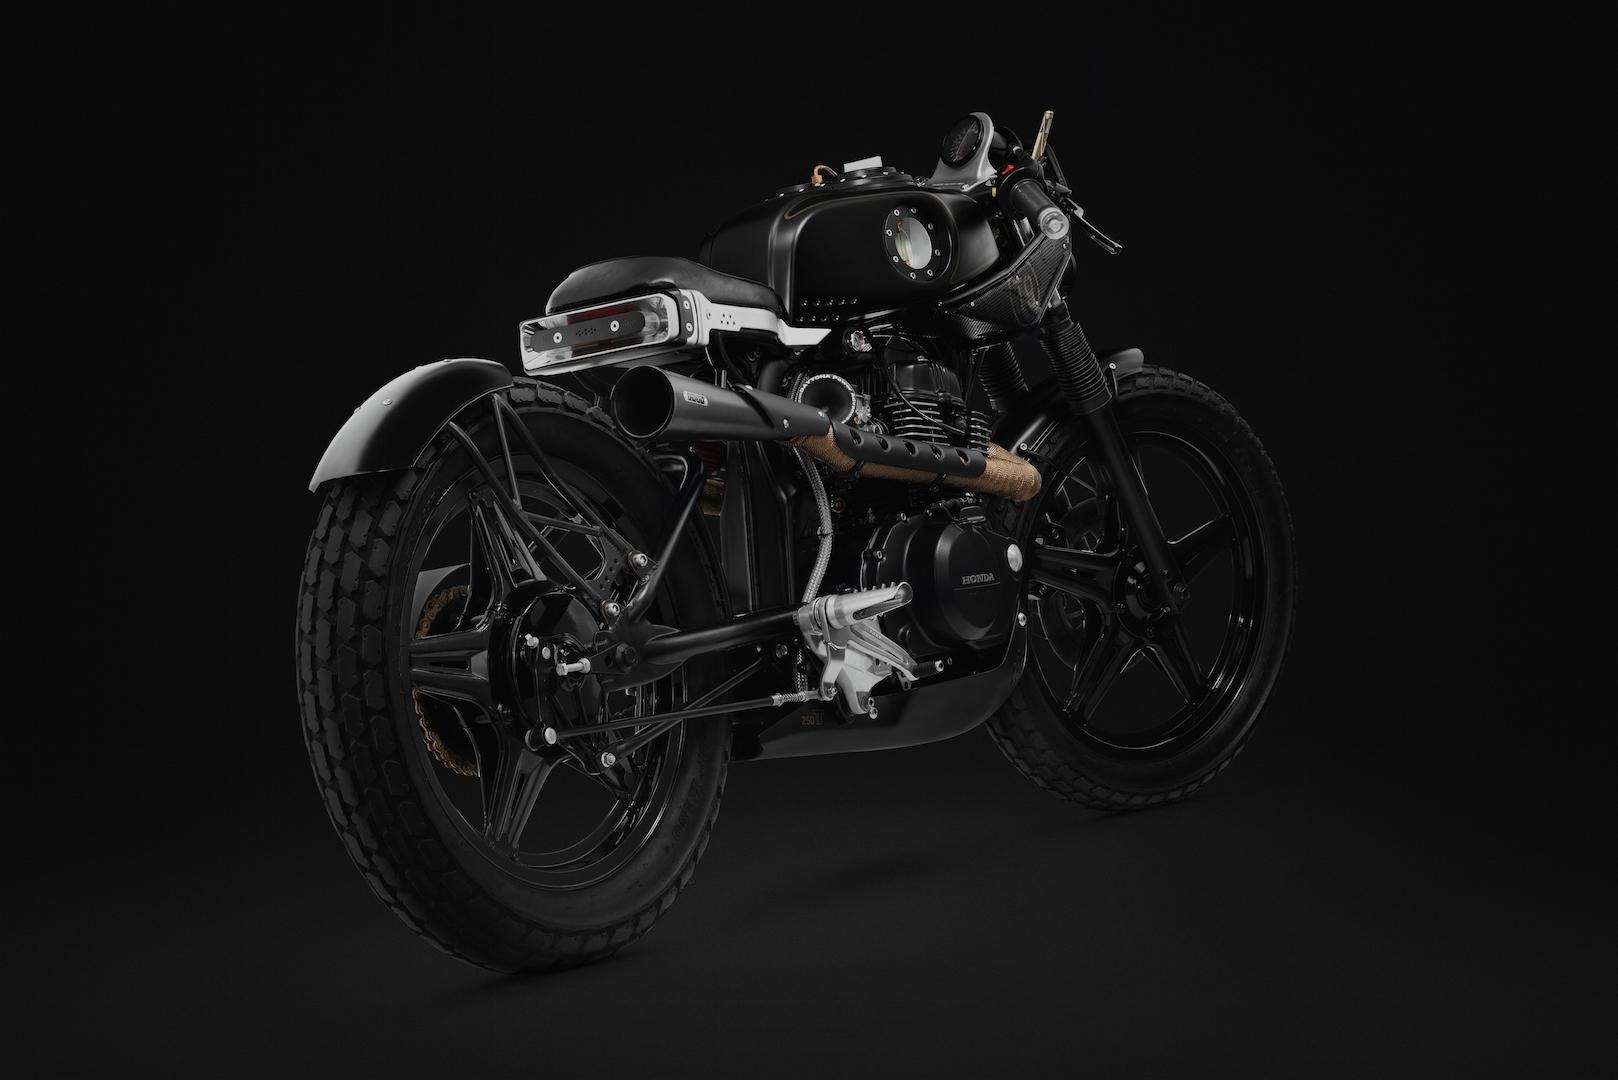 Thrive_Motorcycles_T009_Honda_CB250_Custom_Moto-Mucci (3).jpg